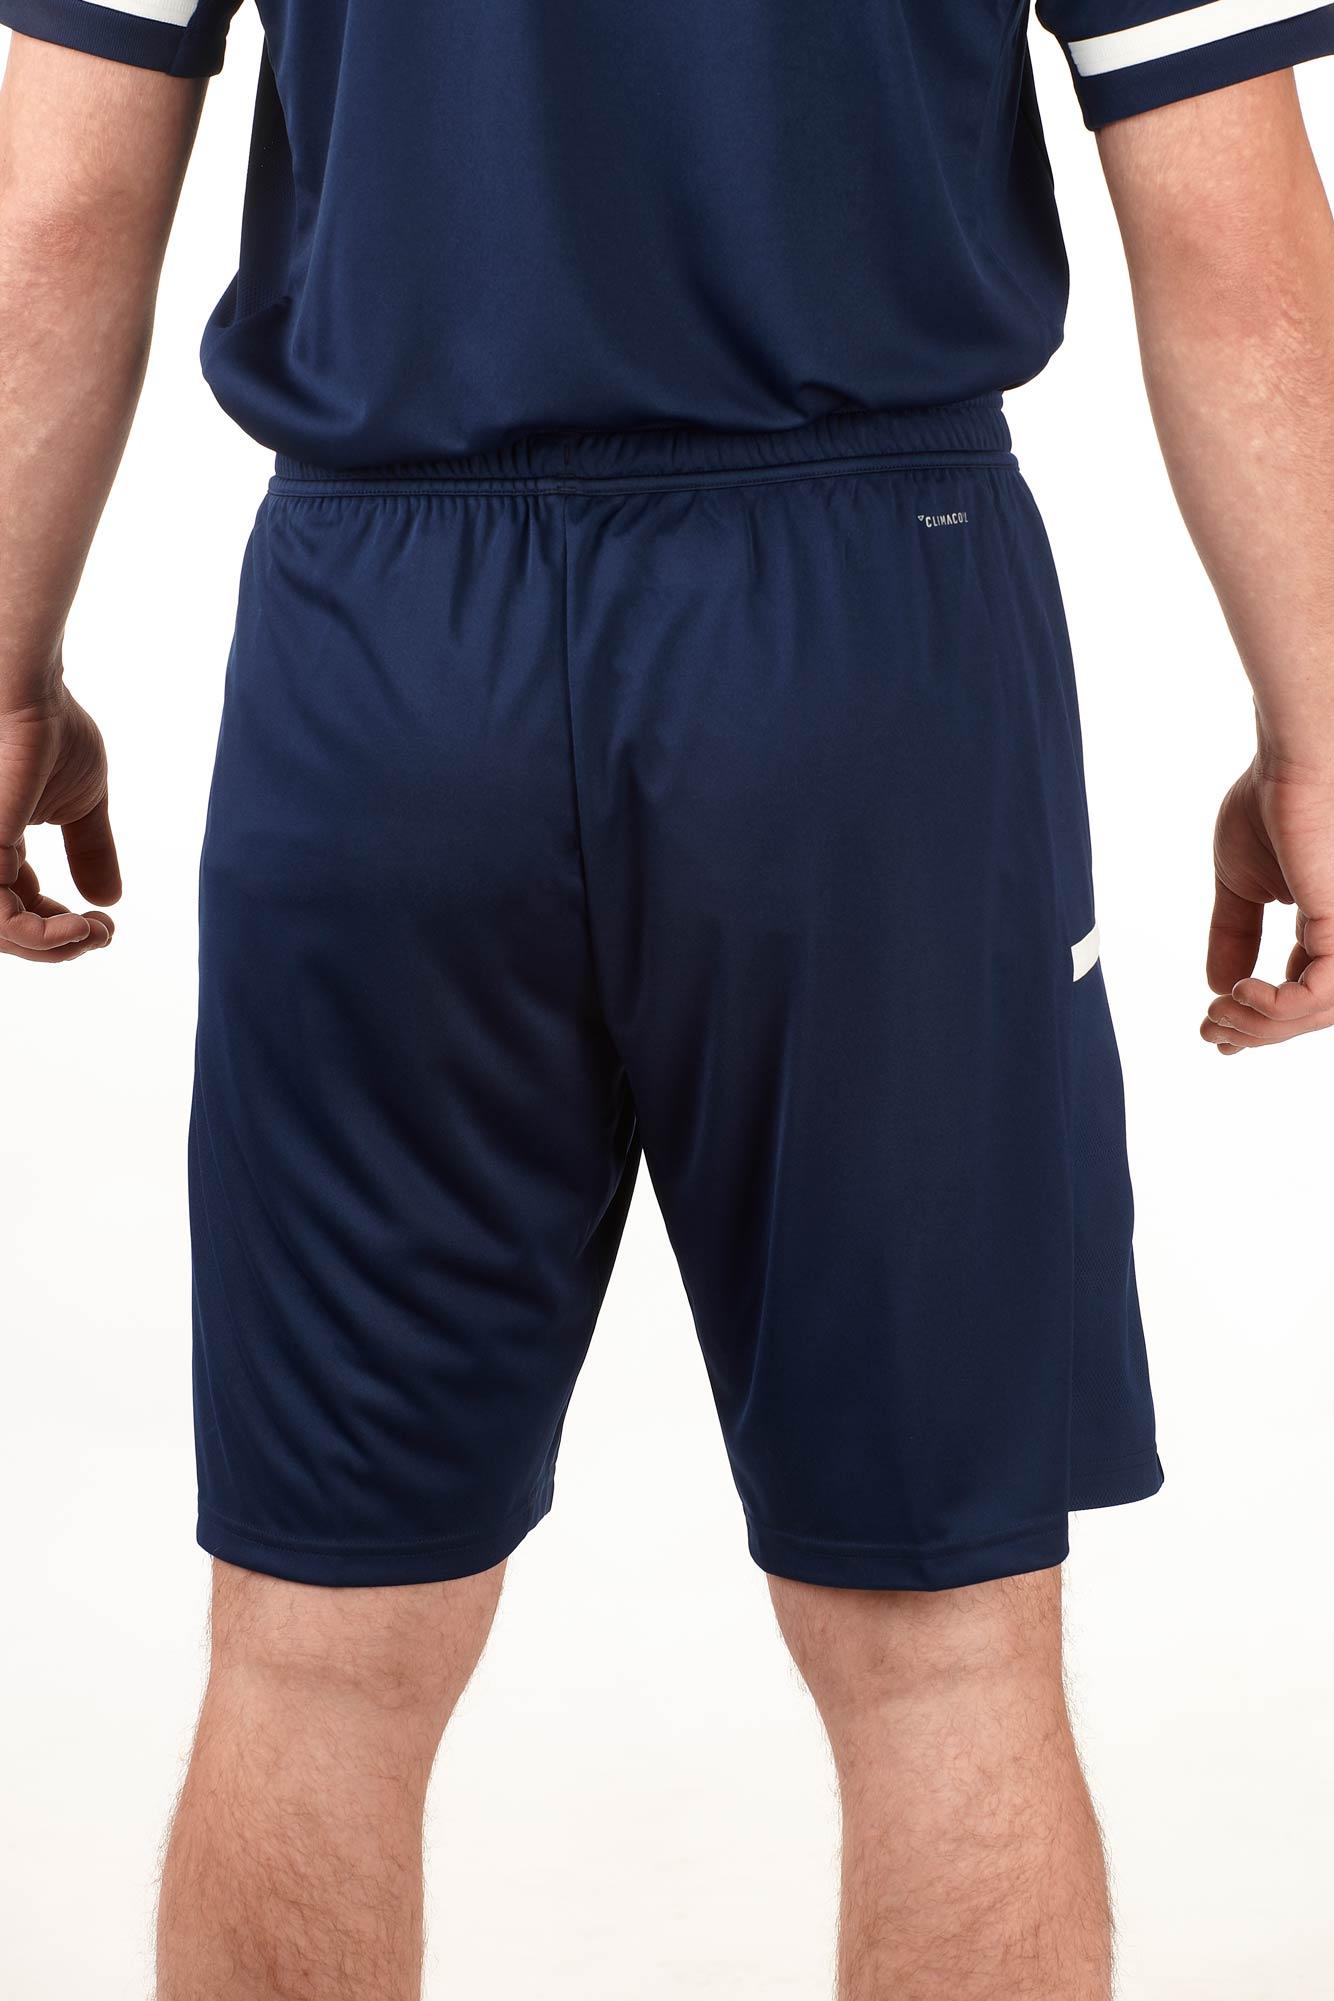 adidas T19 Knee Shorts Männer blauweiß, DY8826